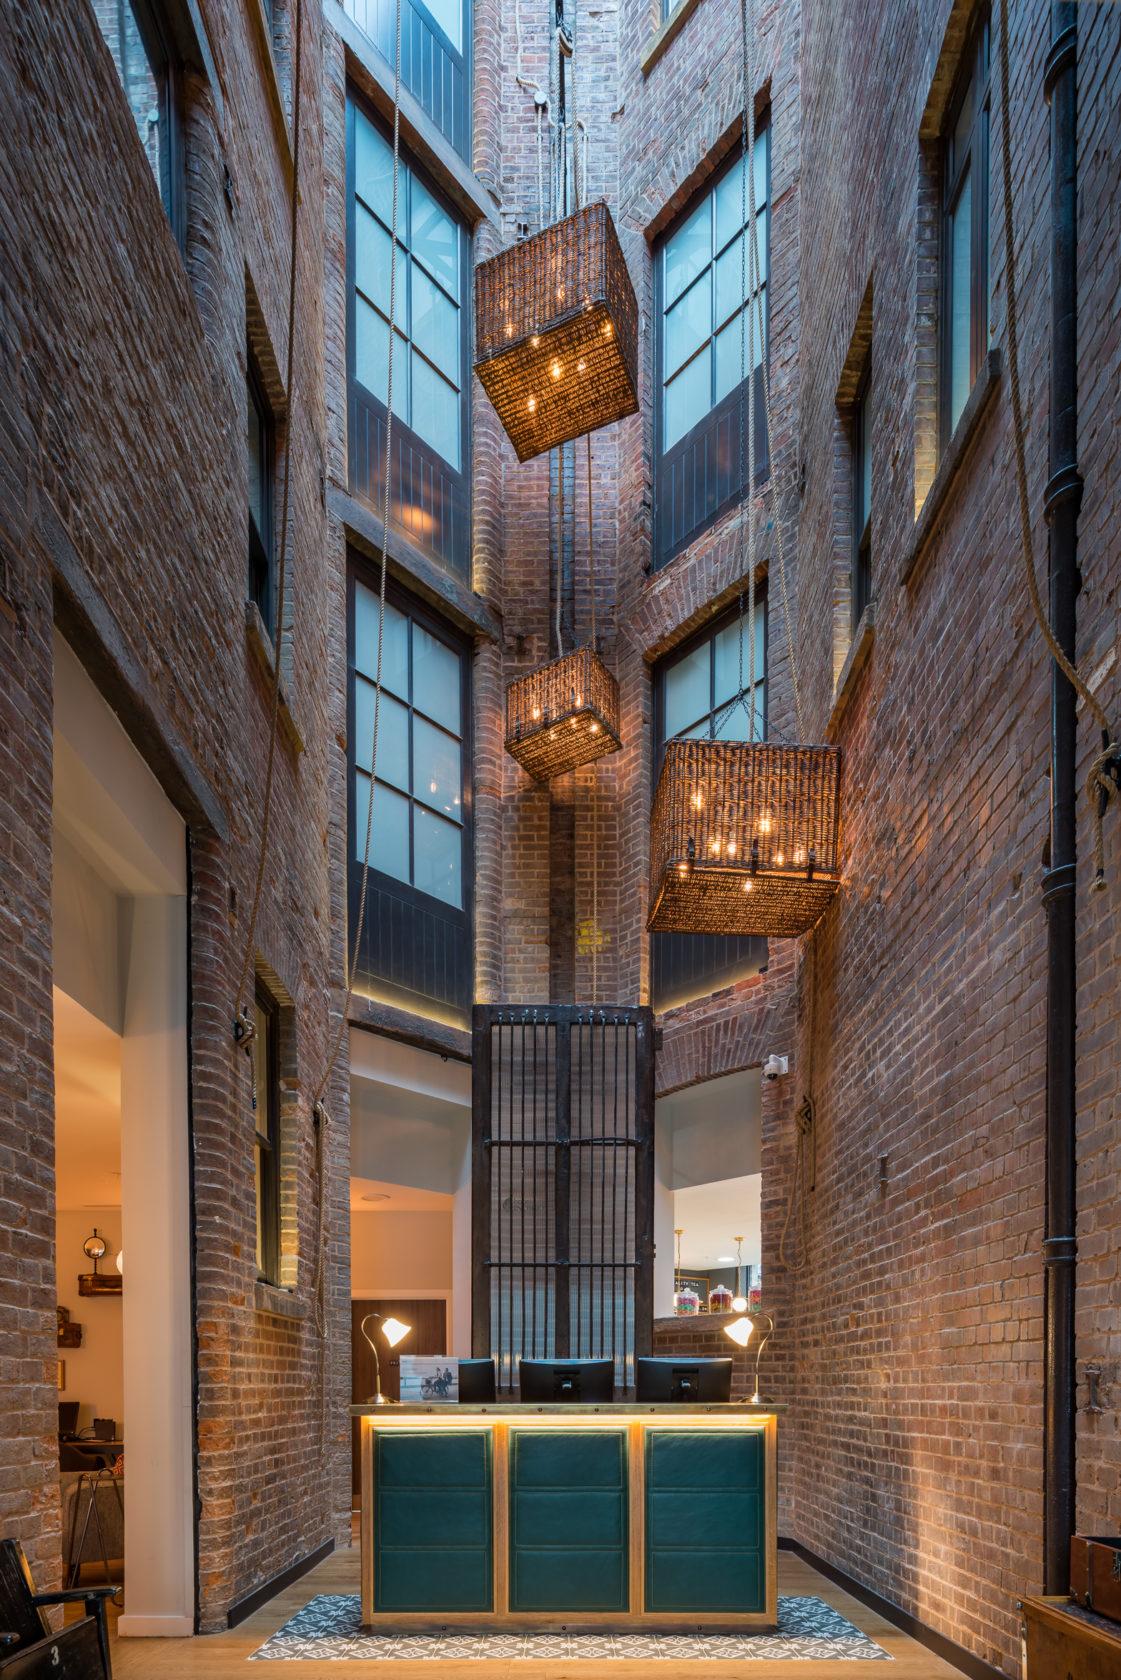 Hotel Indigo Manchester Scottish Design Awards 2019